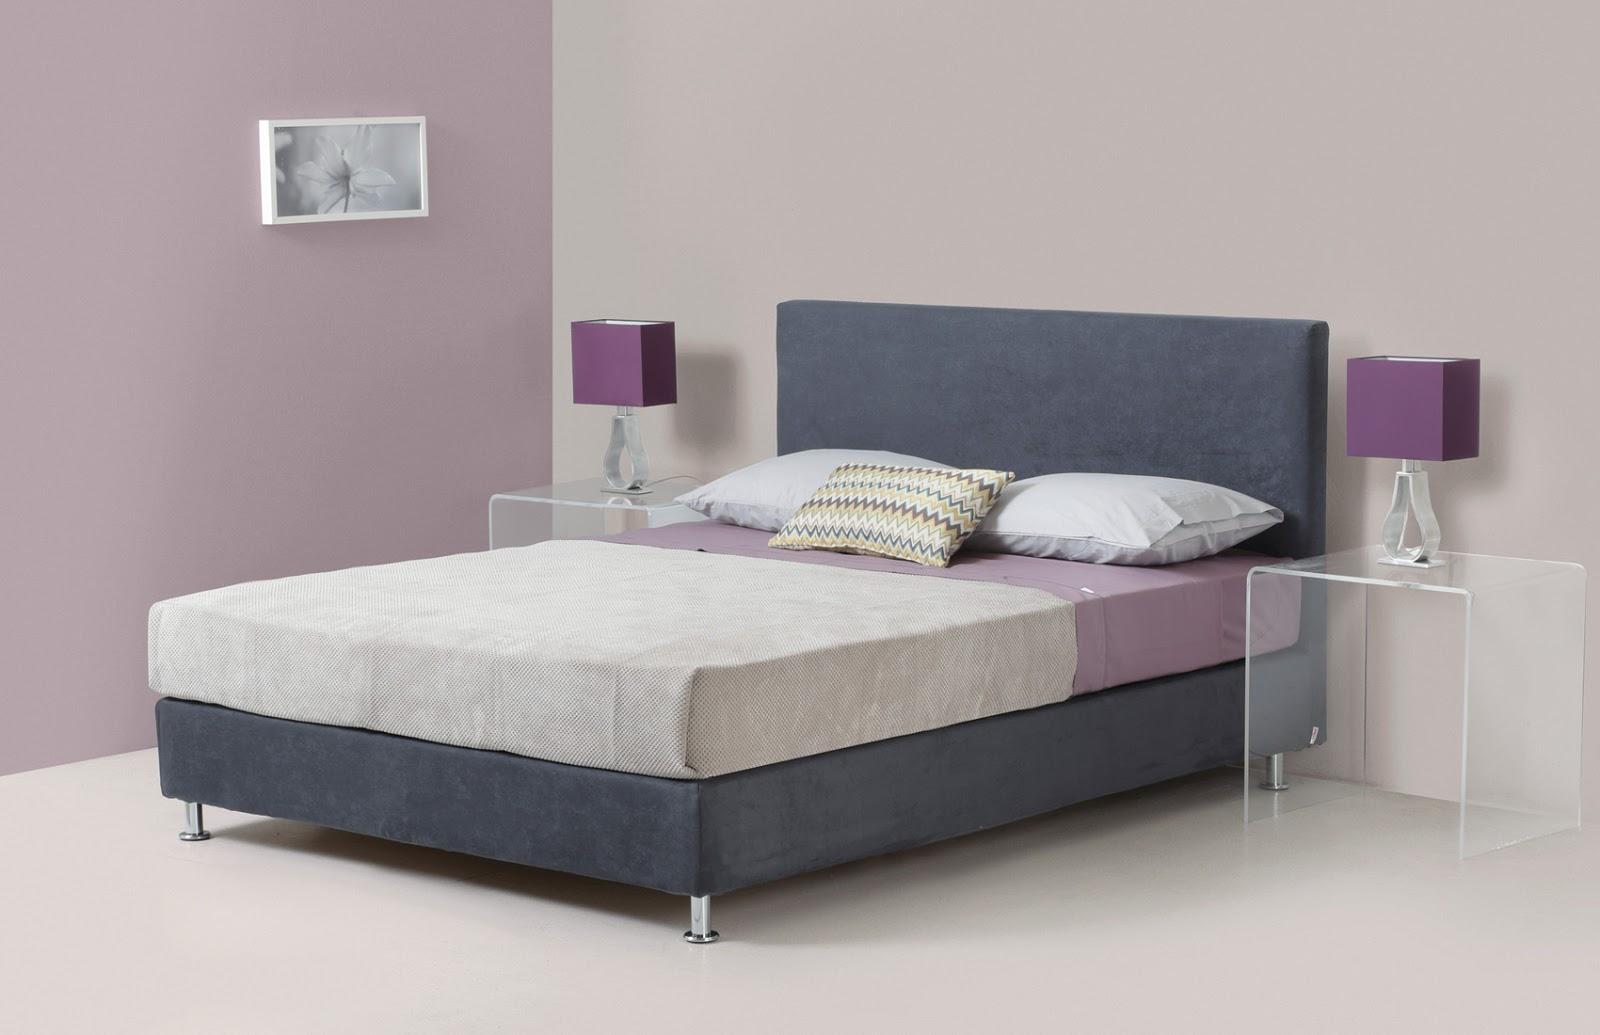 0f419eab932 Ντυμένα κρεβάτια Linea strom Media strom με ύφασμα & δέρμα ΠΡΟΣΦΟΡΑ ...